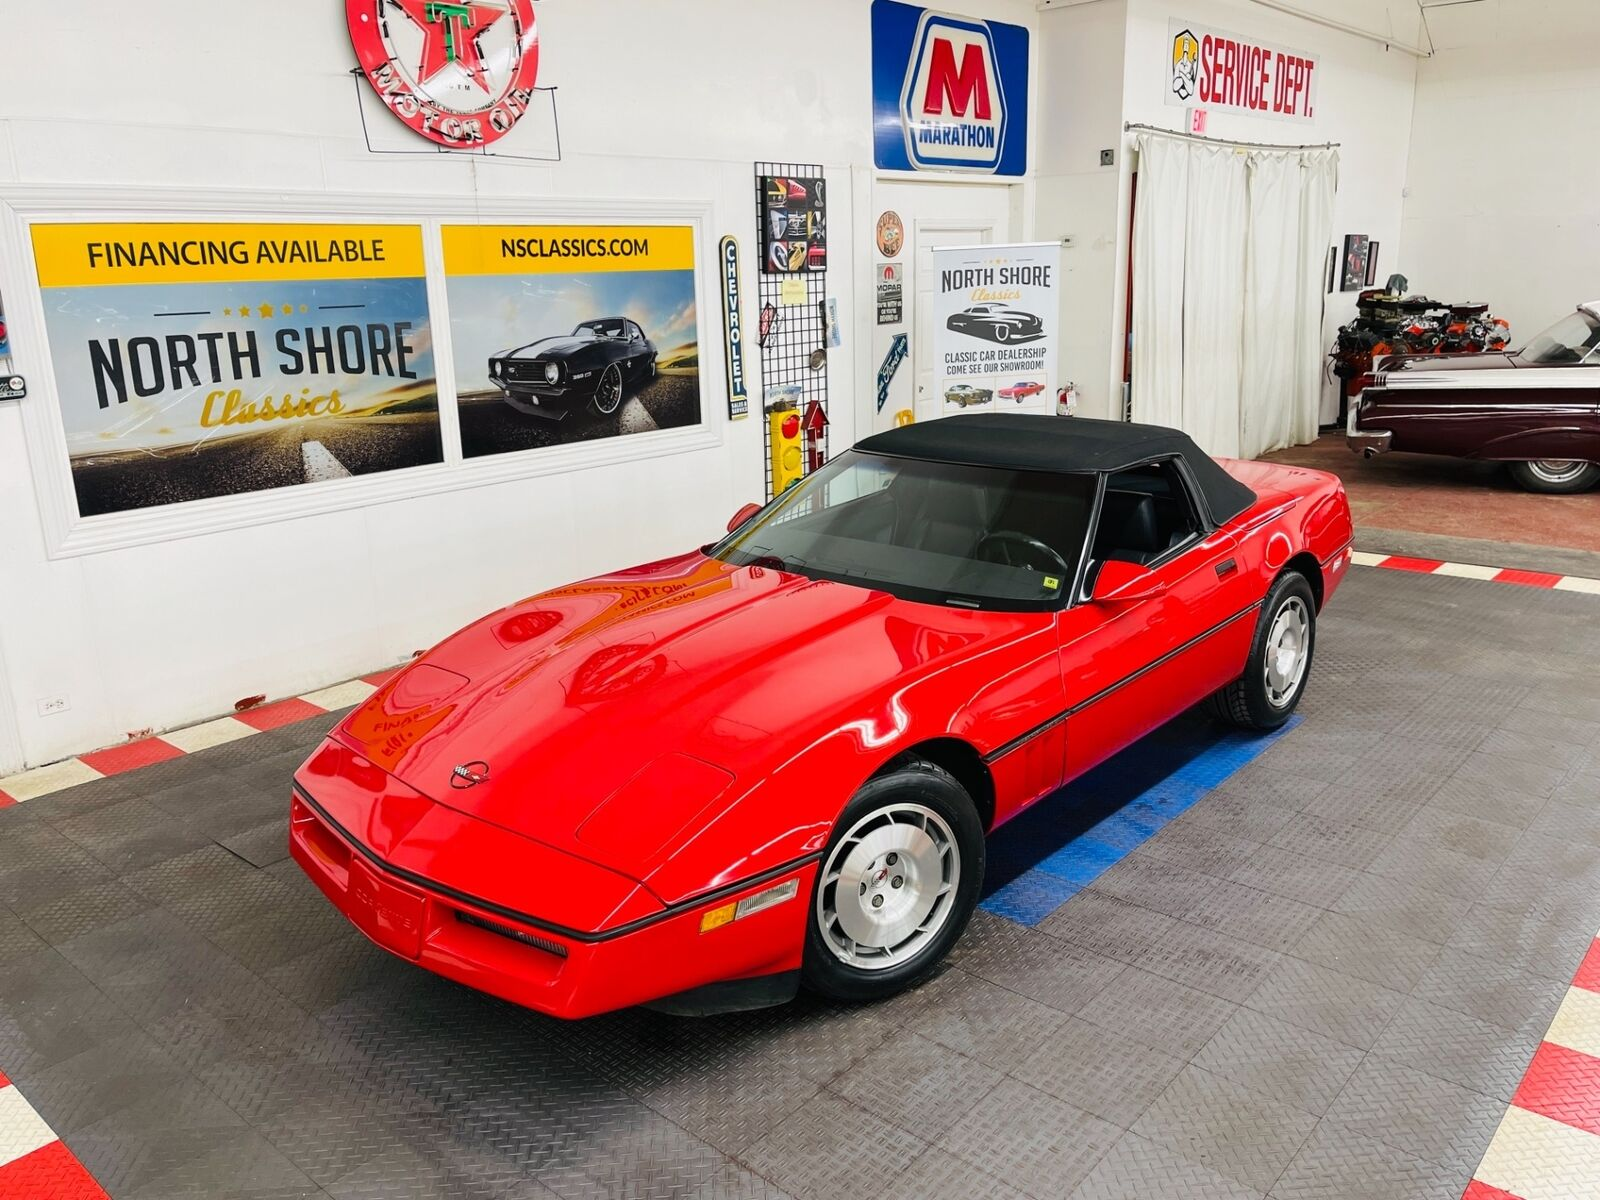 1986 Red Chevrolet Corvette Convertible  | C4 Corvette Photo 3